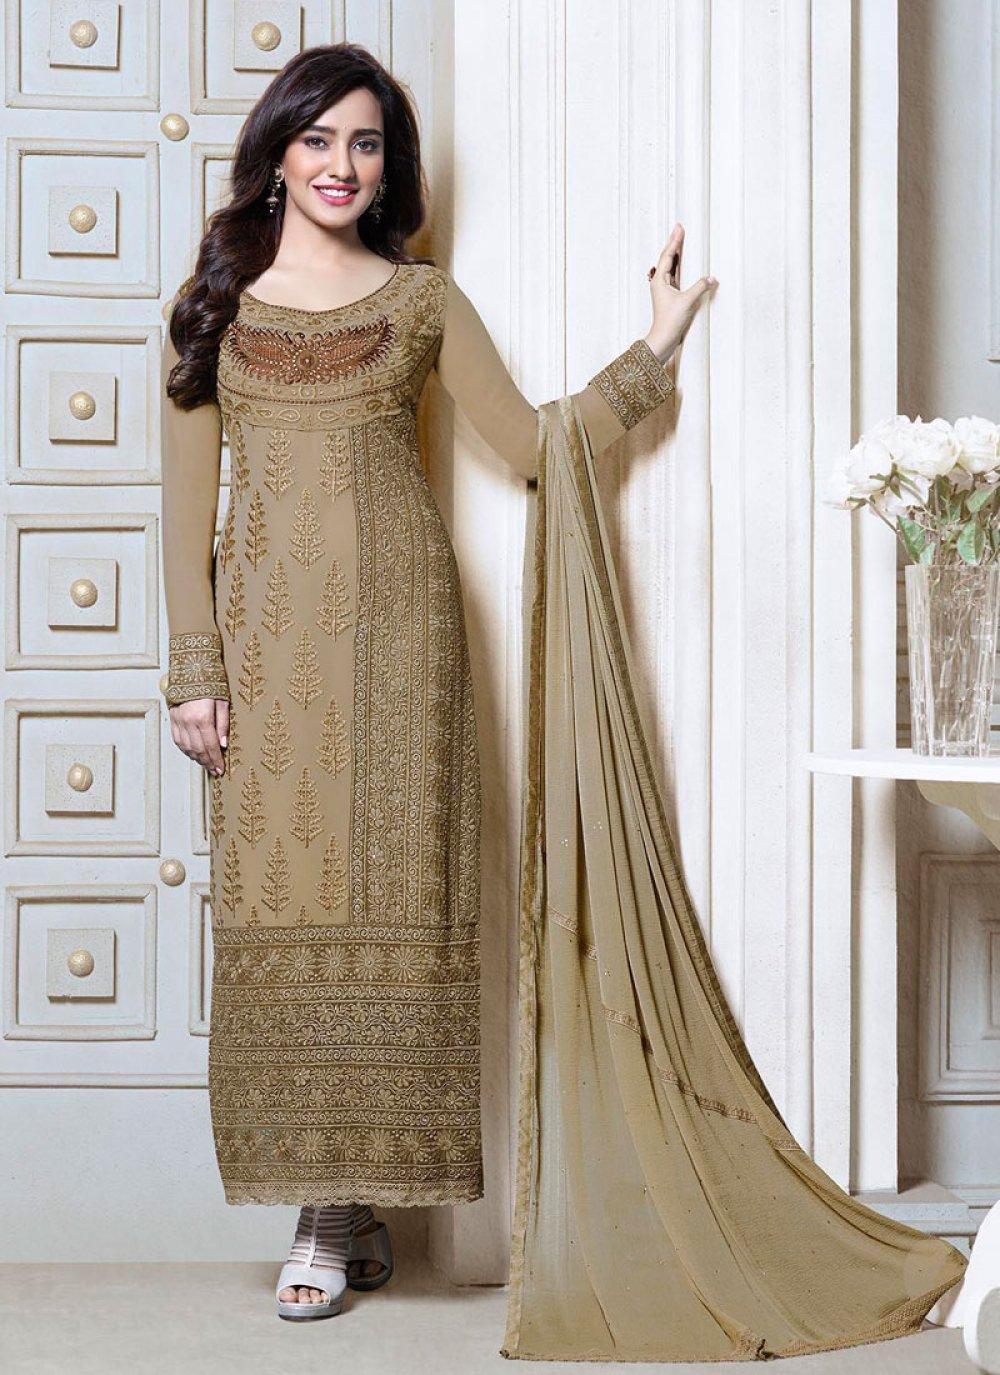 Neha Sharma Embroidery Churidar Suit